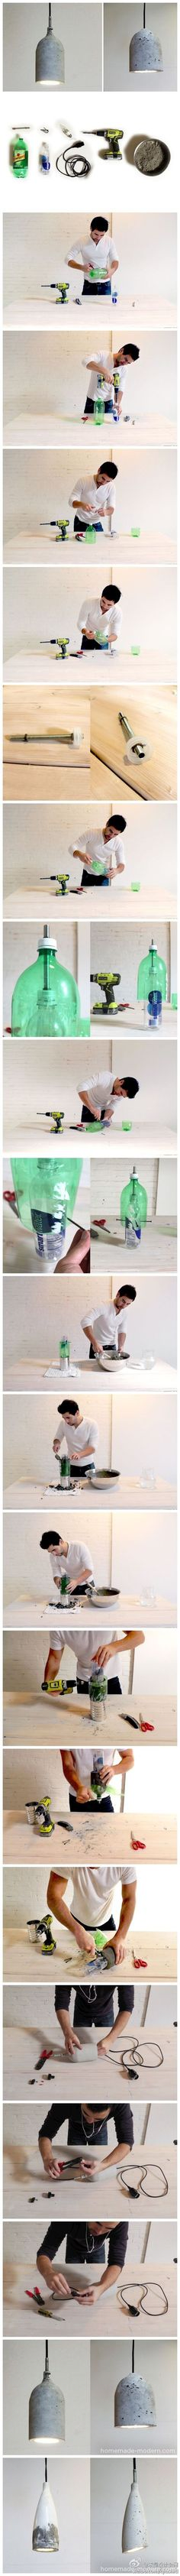 concrete light lamp - tutorial lampada in cemento